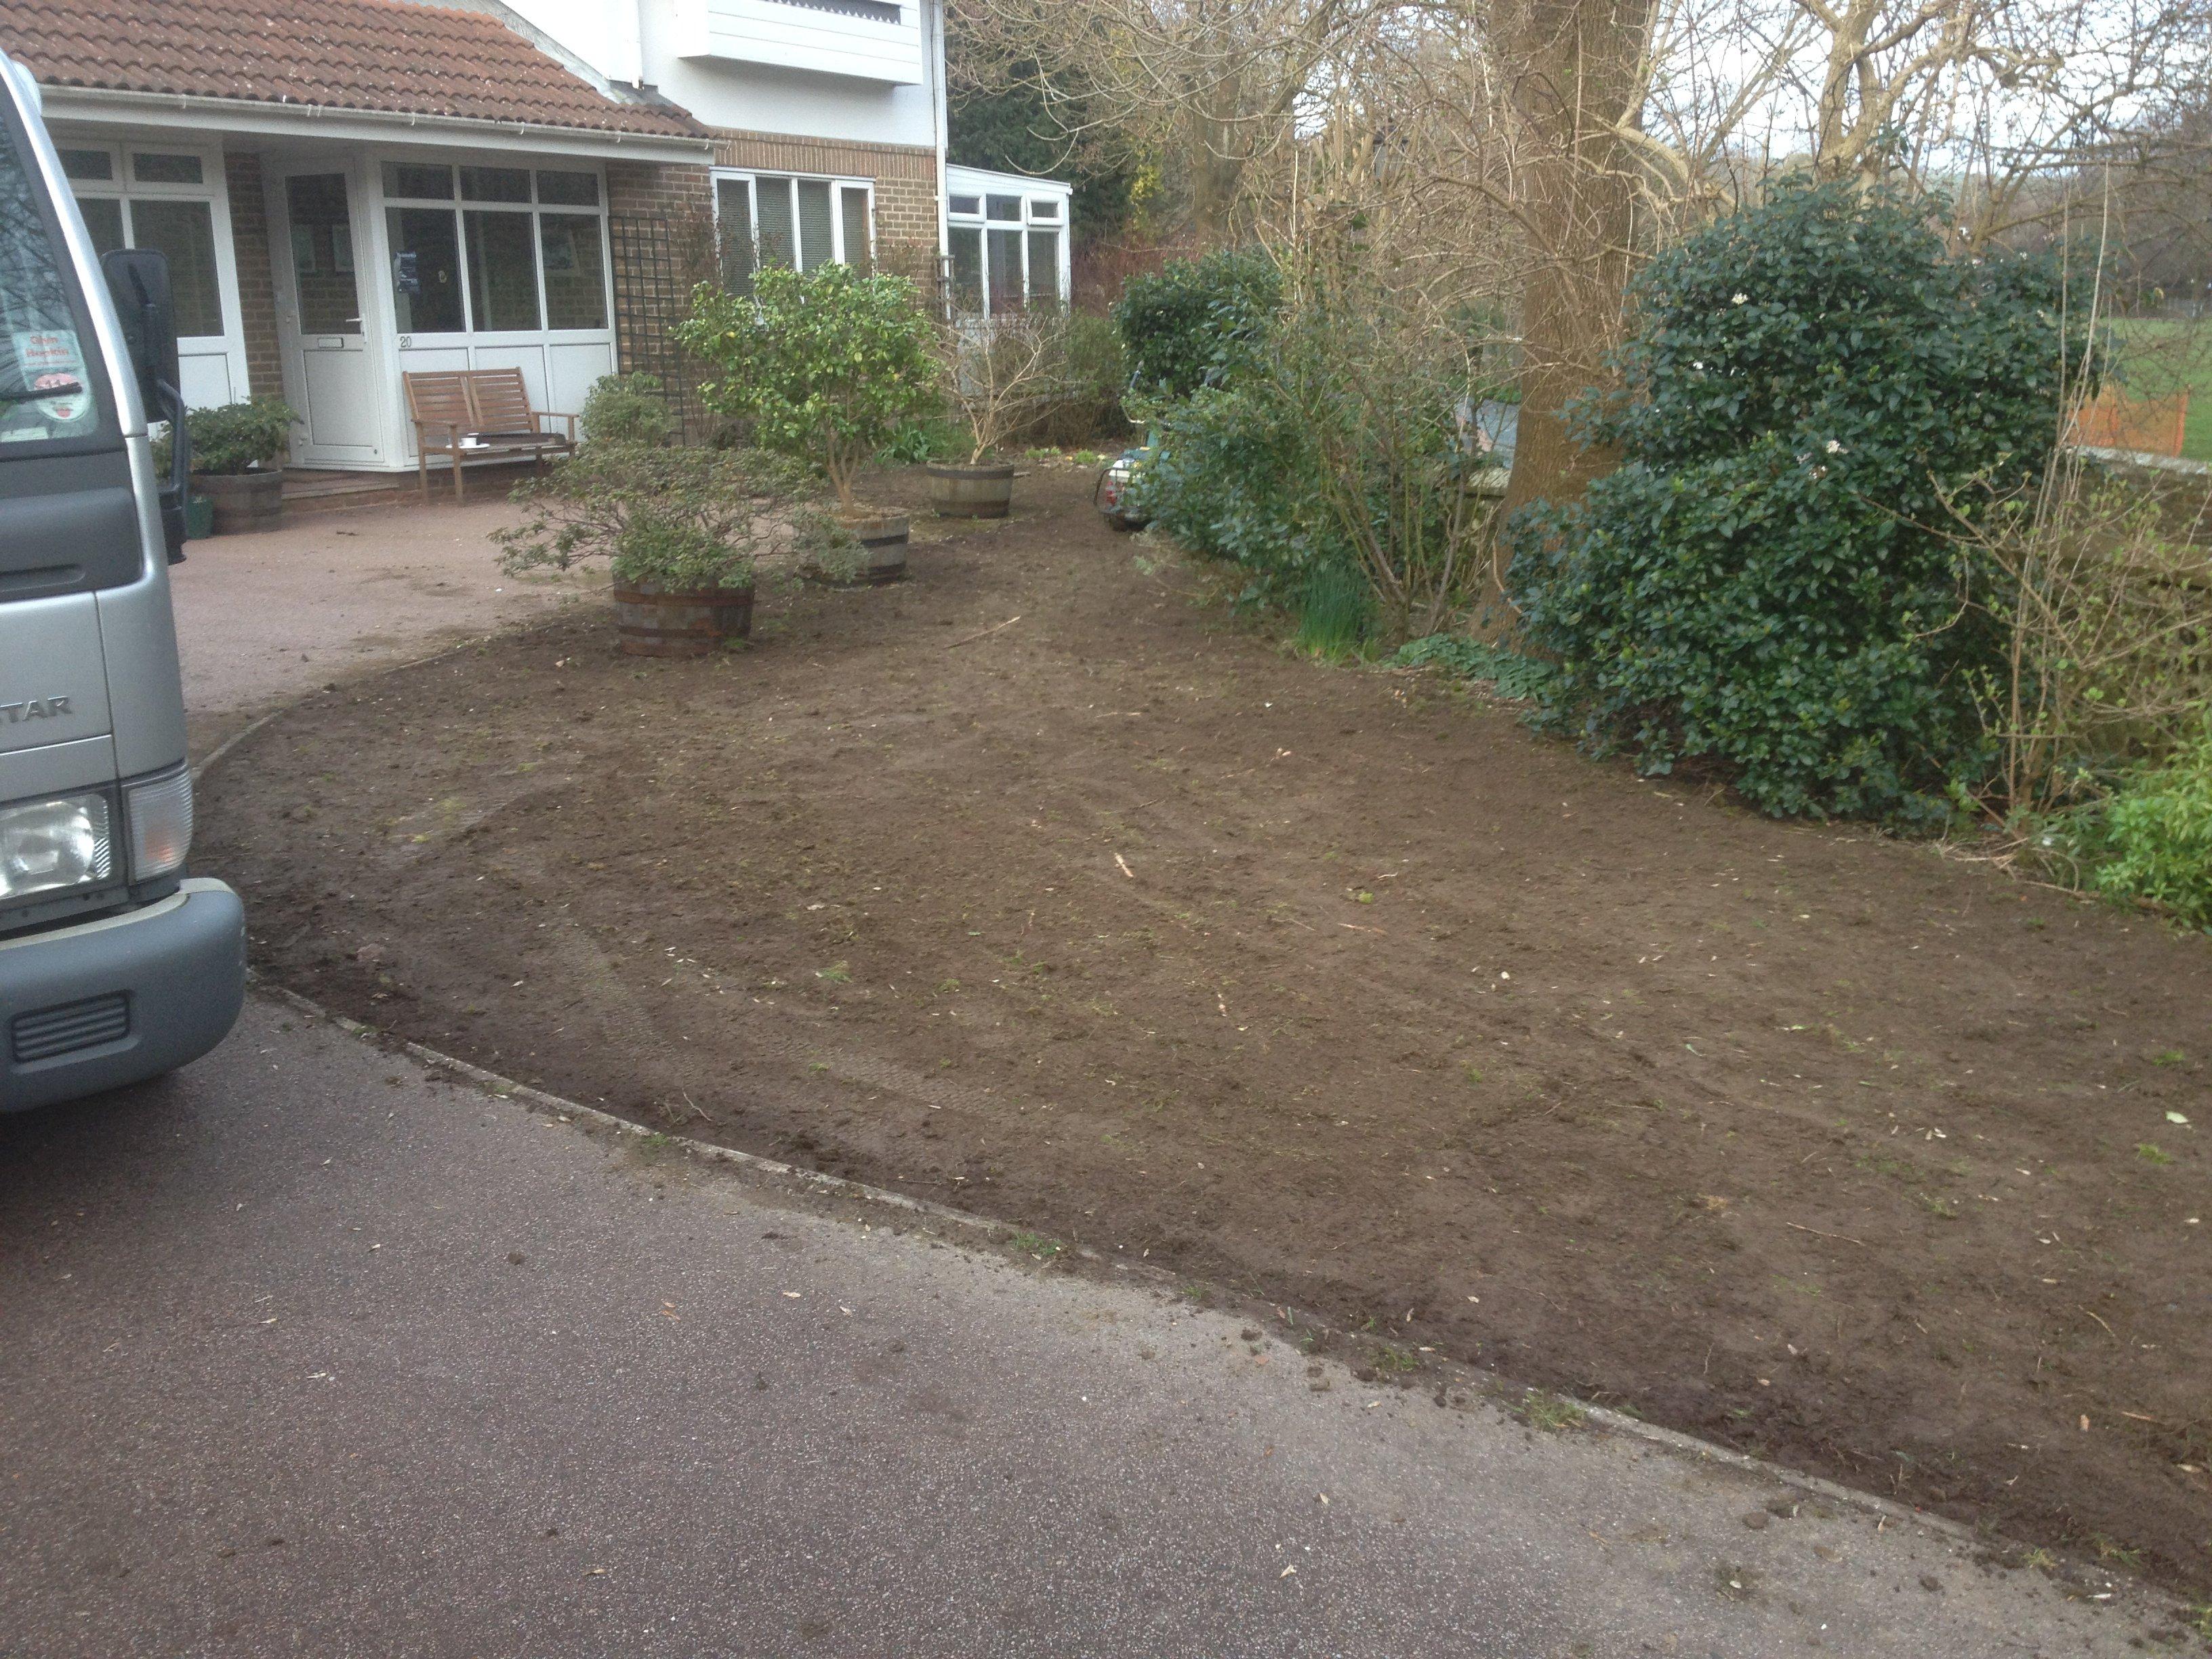 Garden work in progress